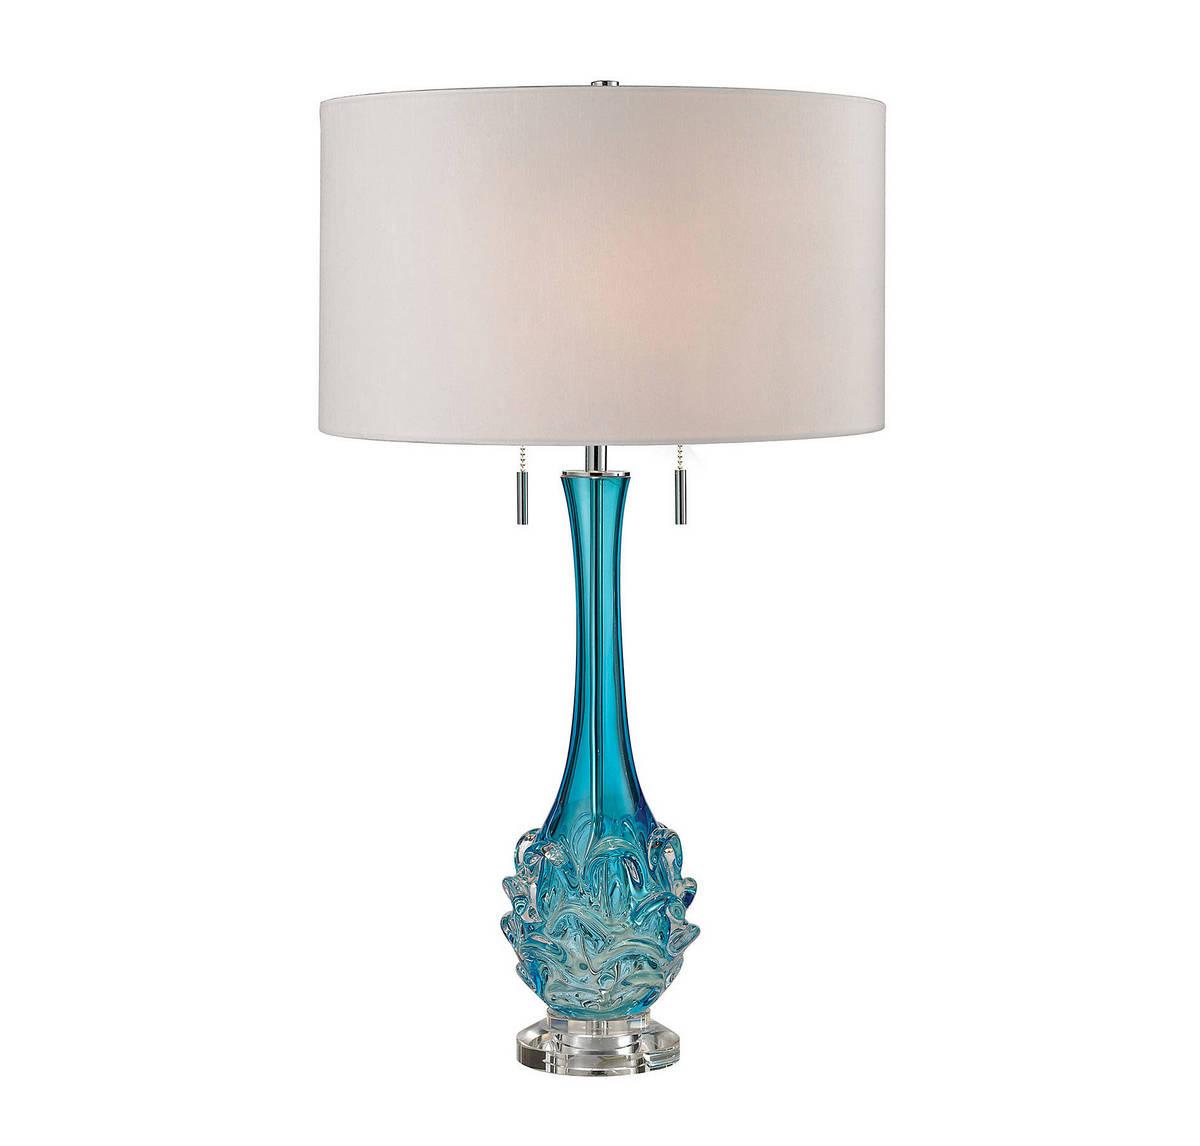 Dimond Vignola 28 Blown Glass Table Lamp in Blue w/White Shade